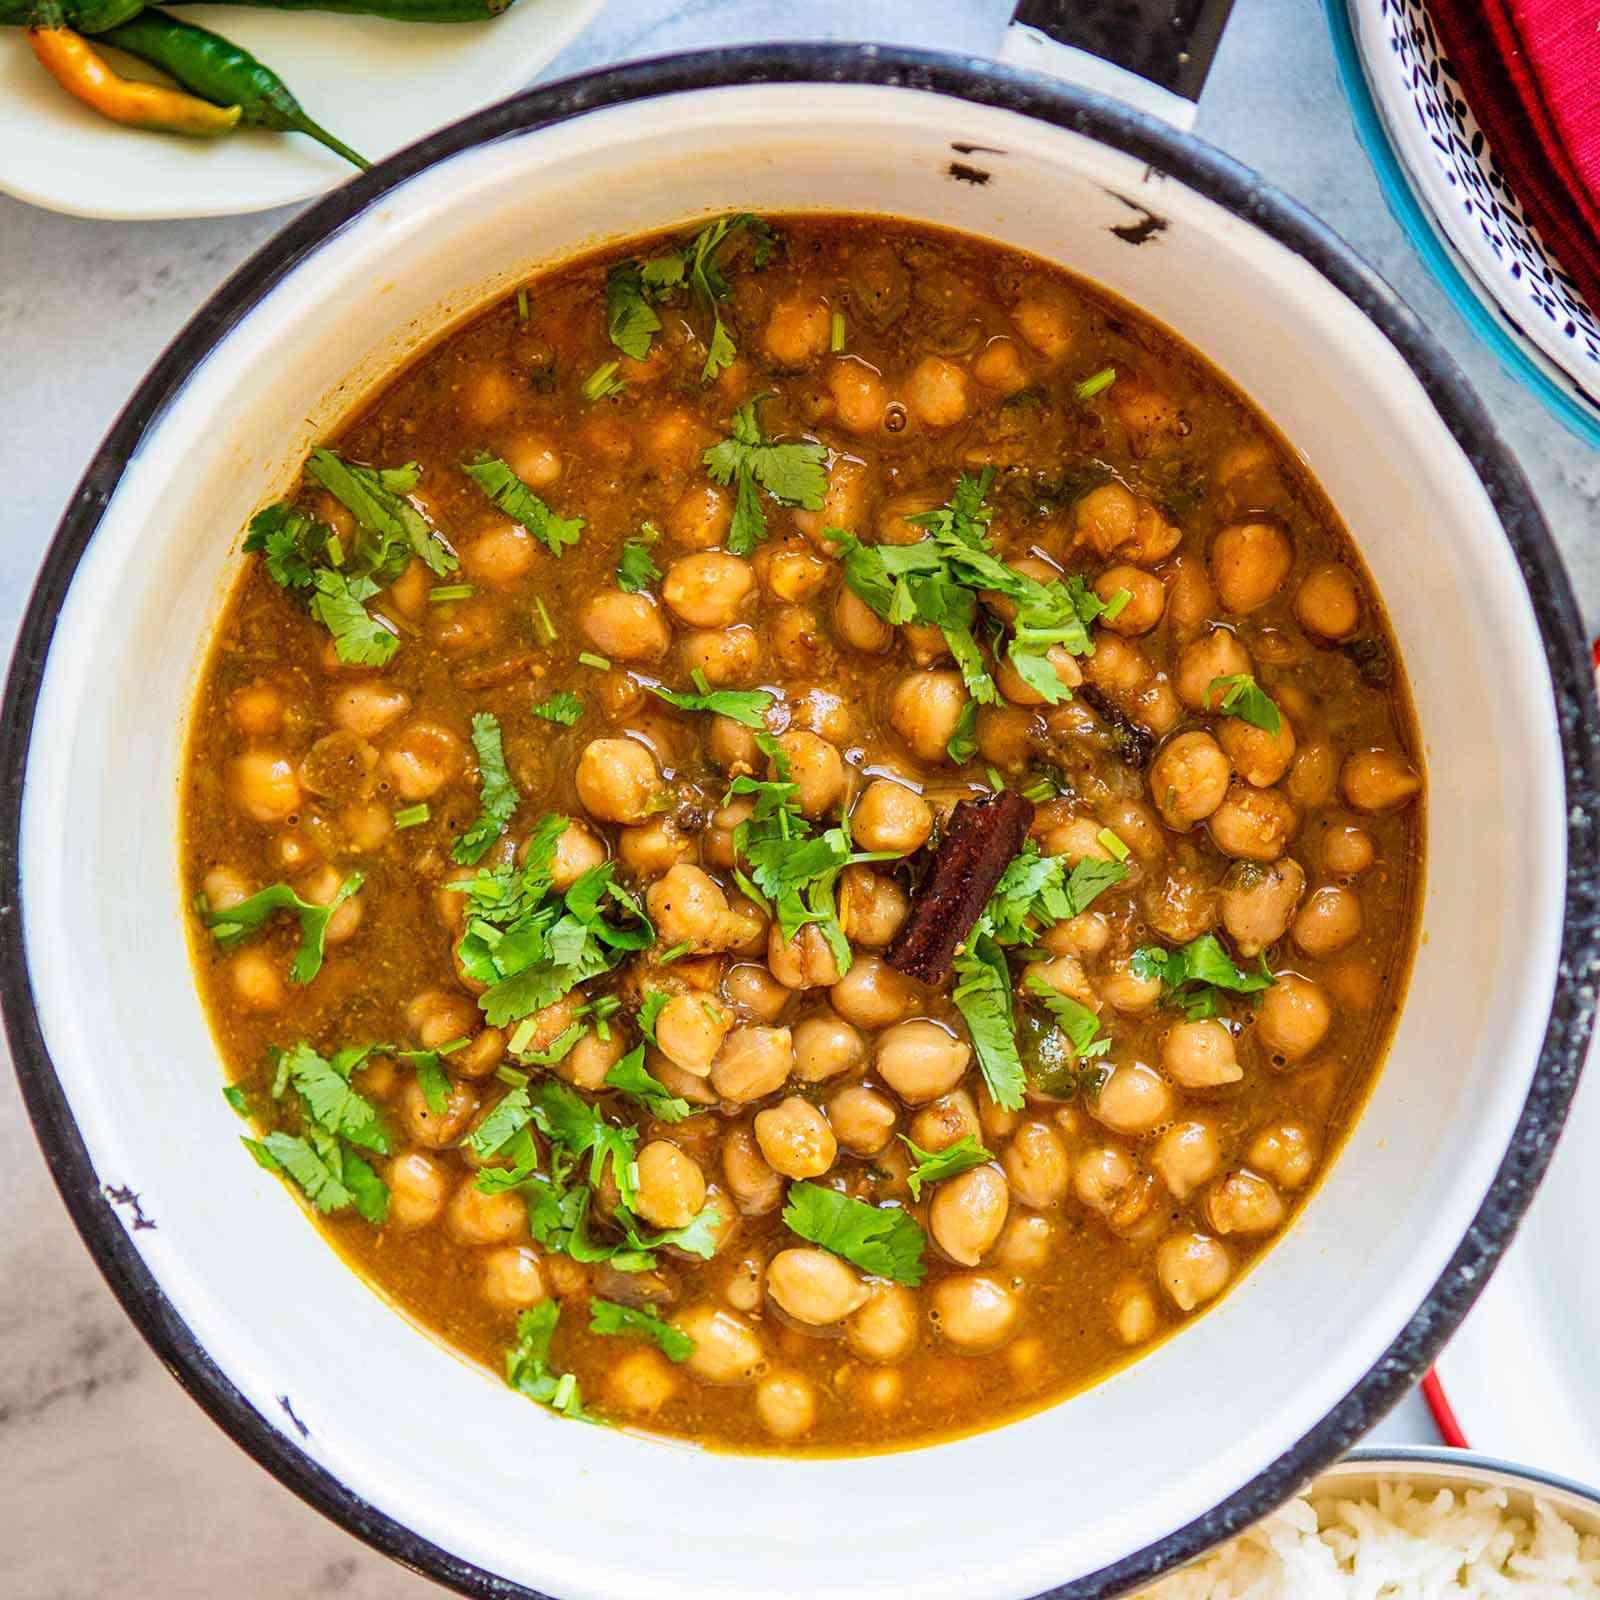 Best Chana Masala - chana masla in pot with fresh green herbs sprinkled on top.